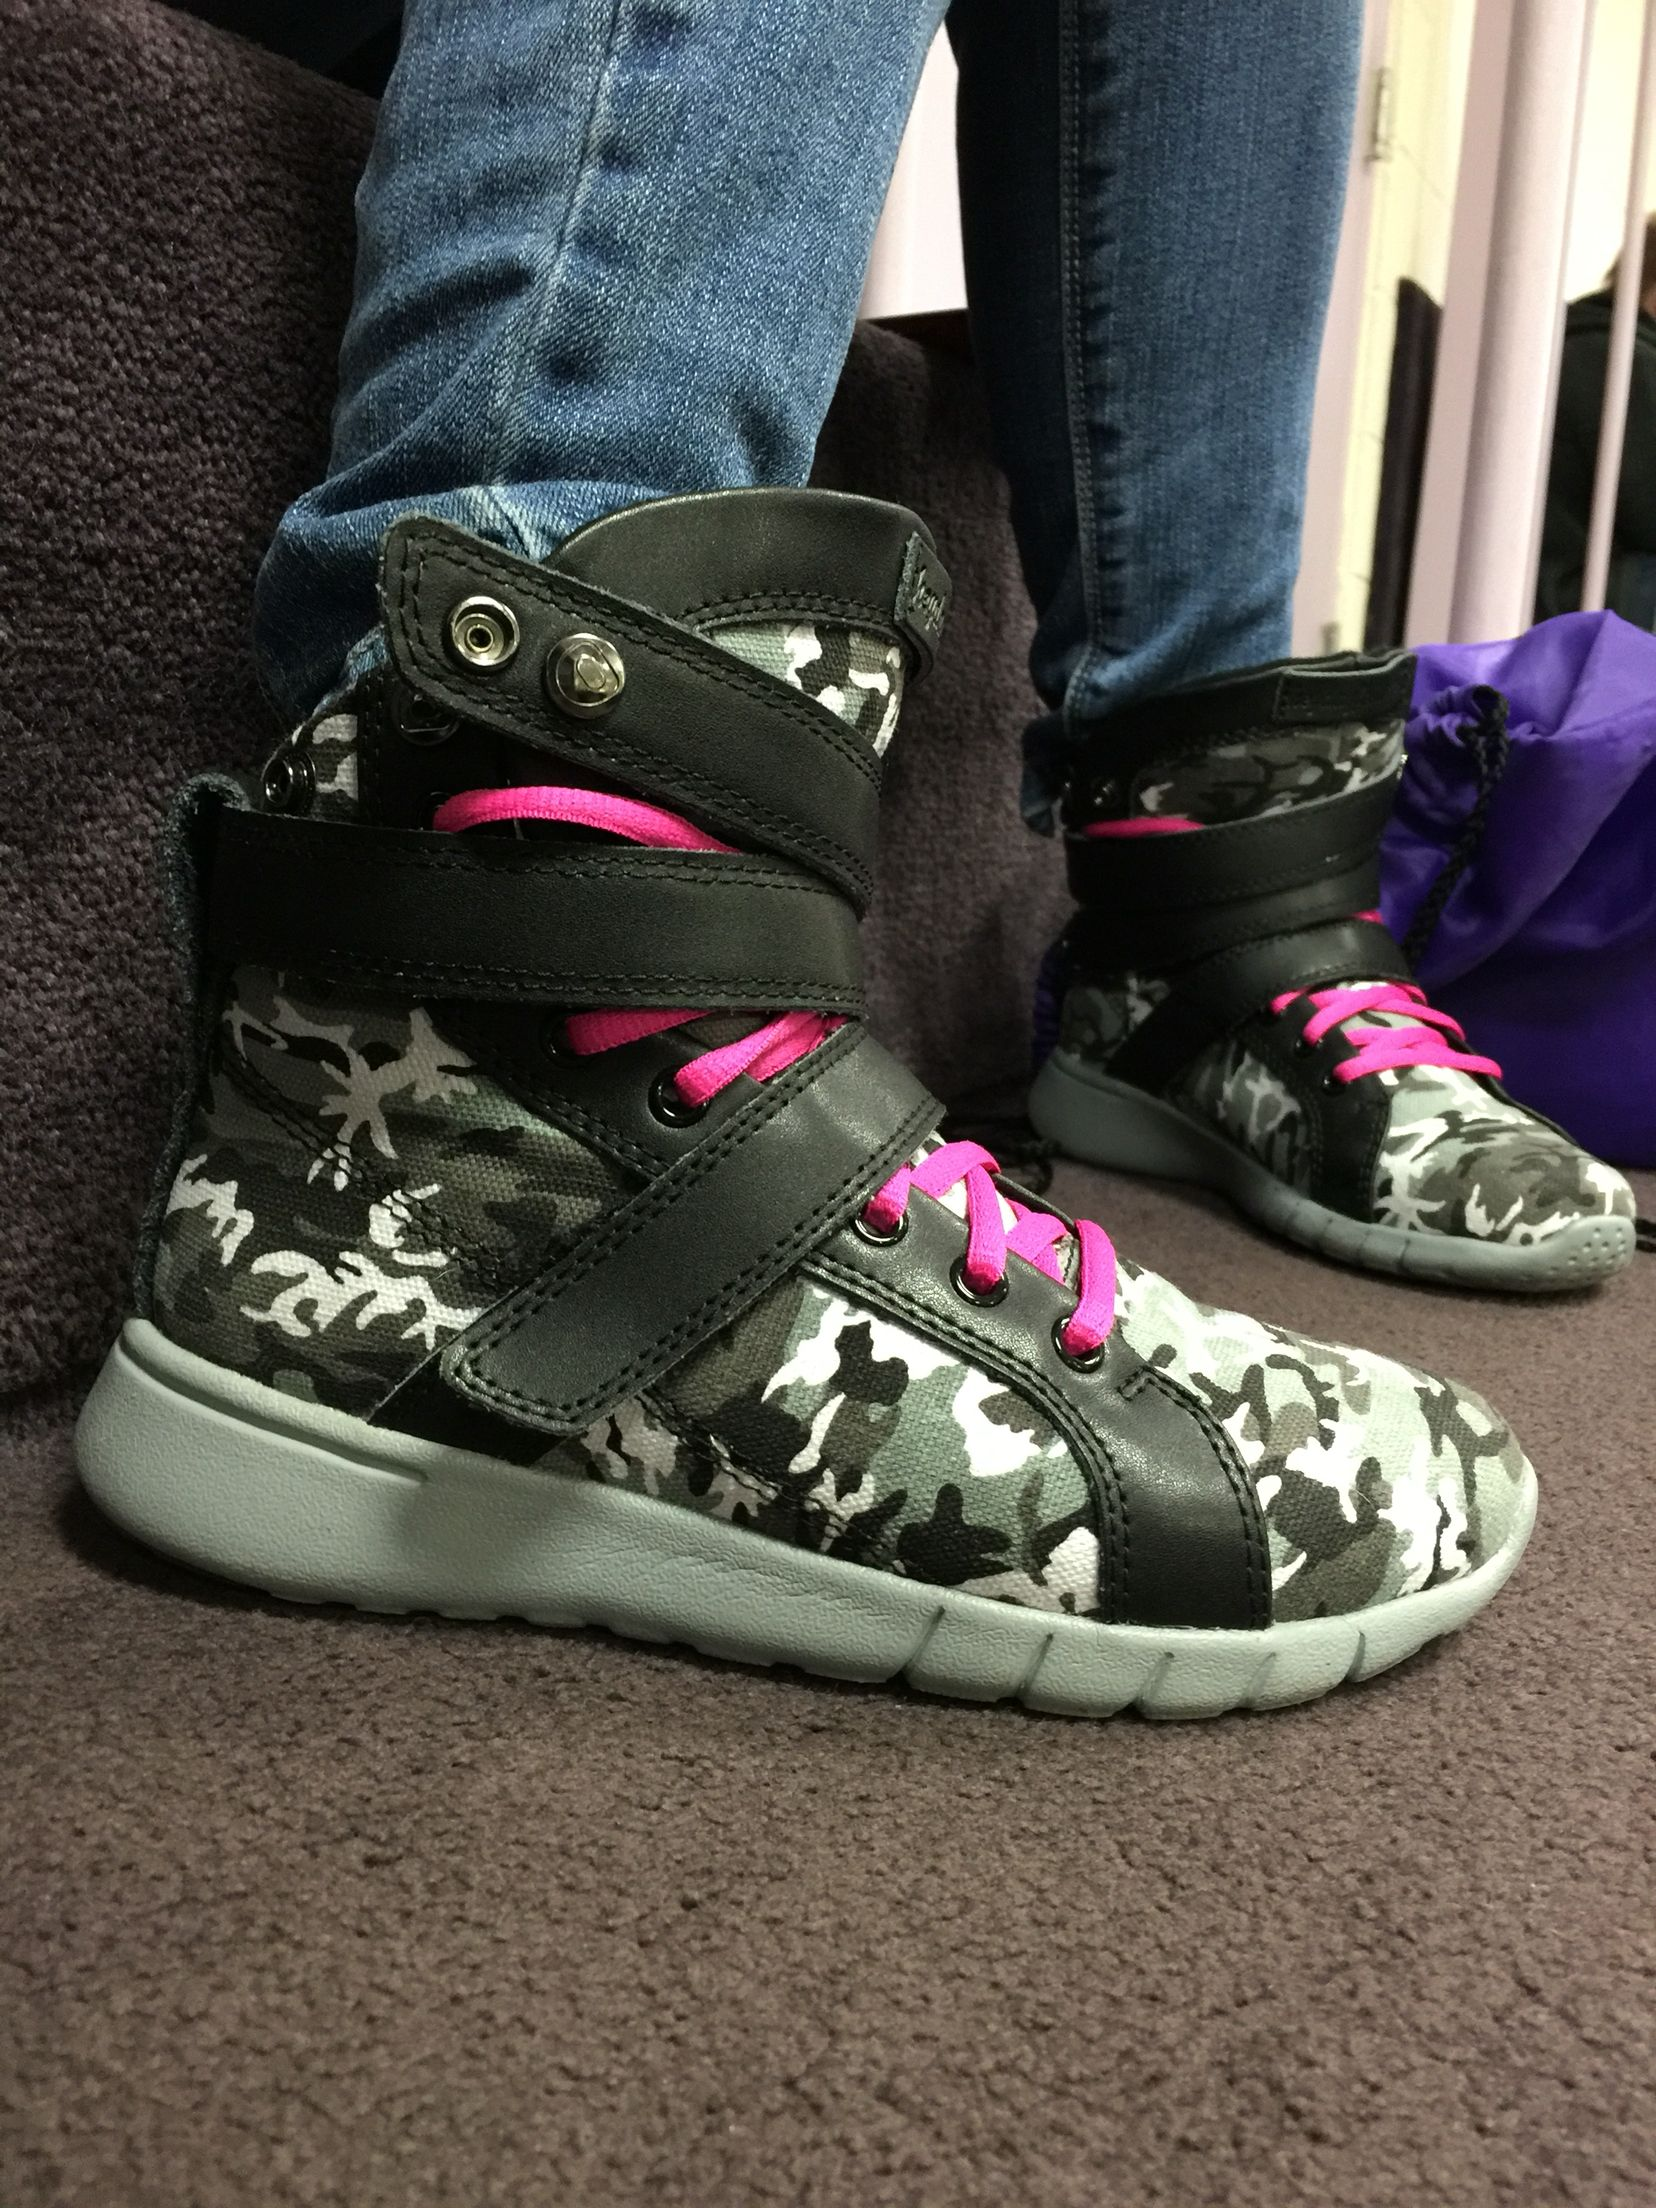 Urban camo high top gym sneakers www